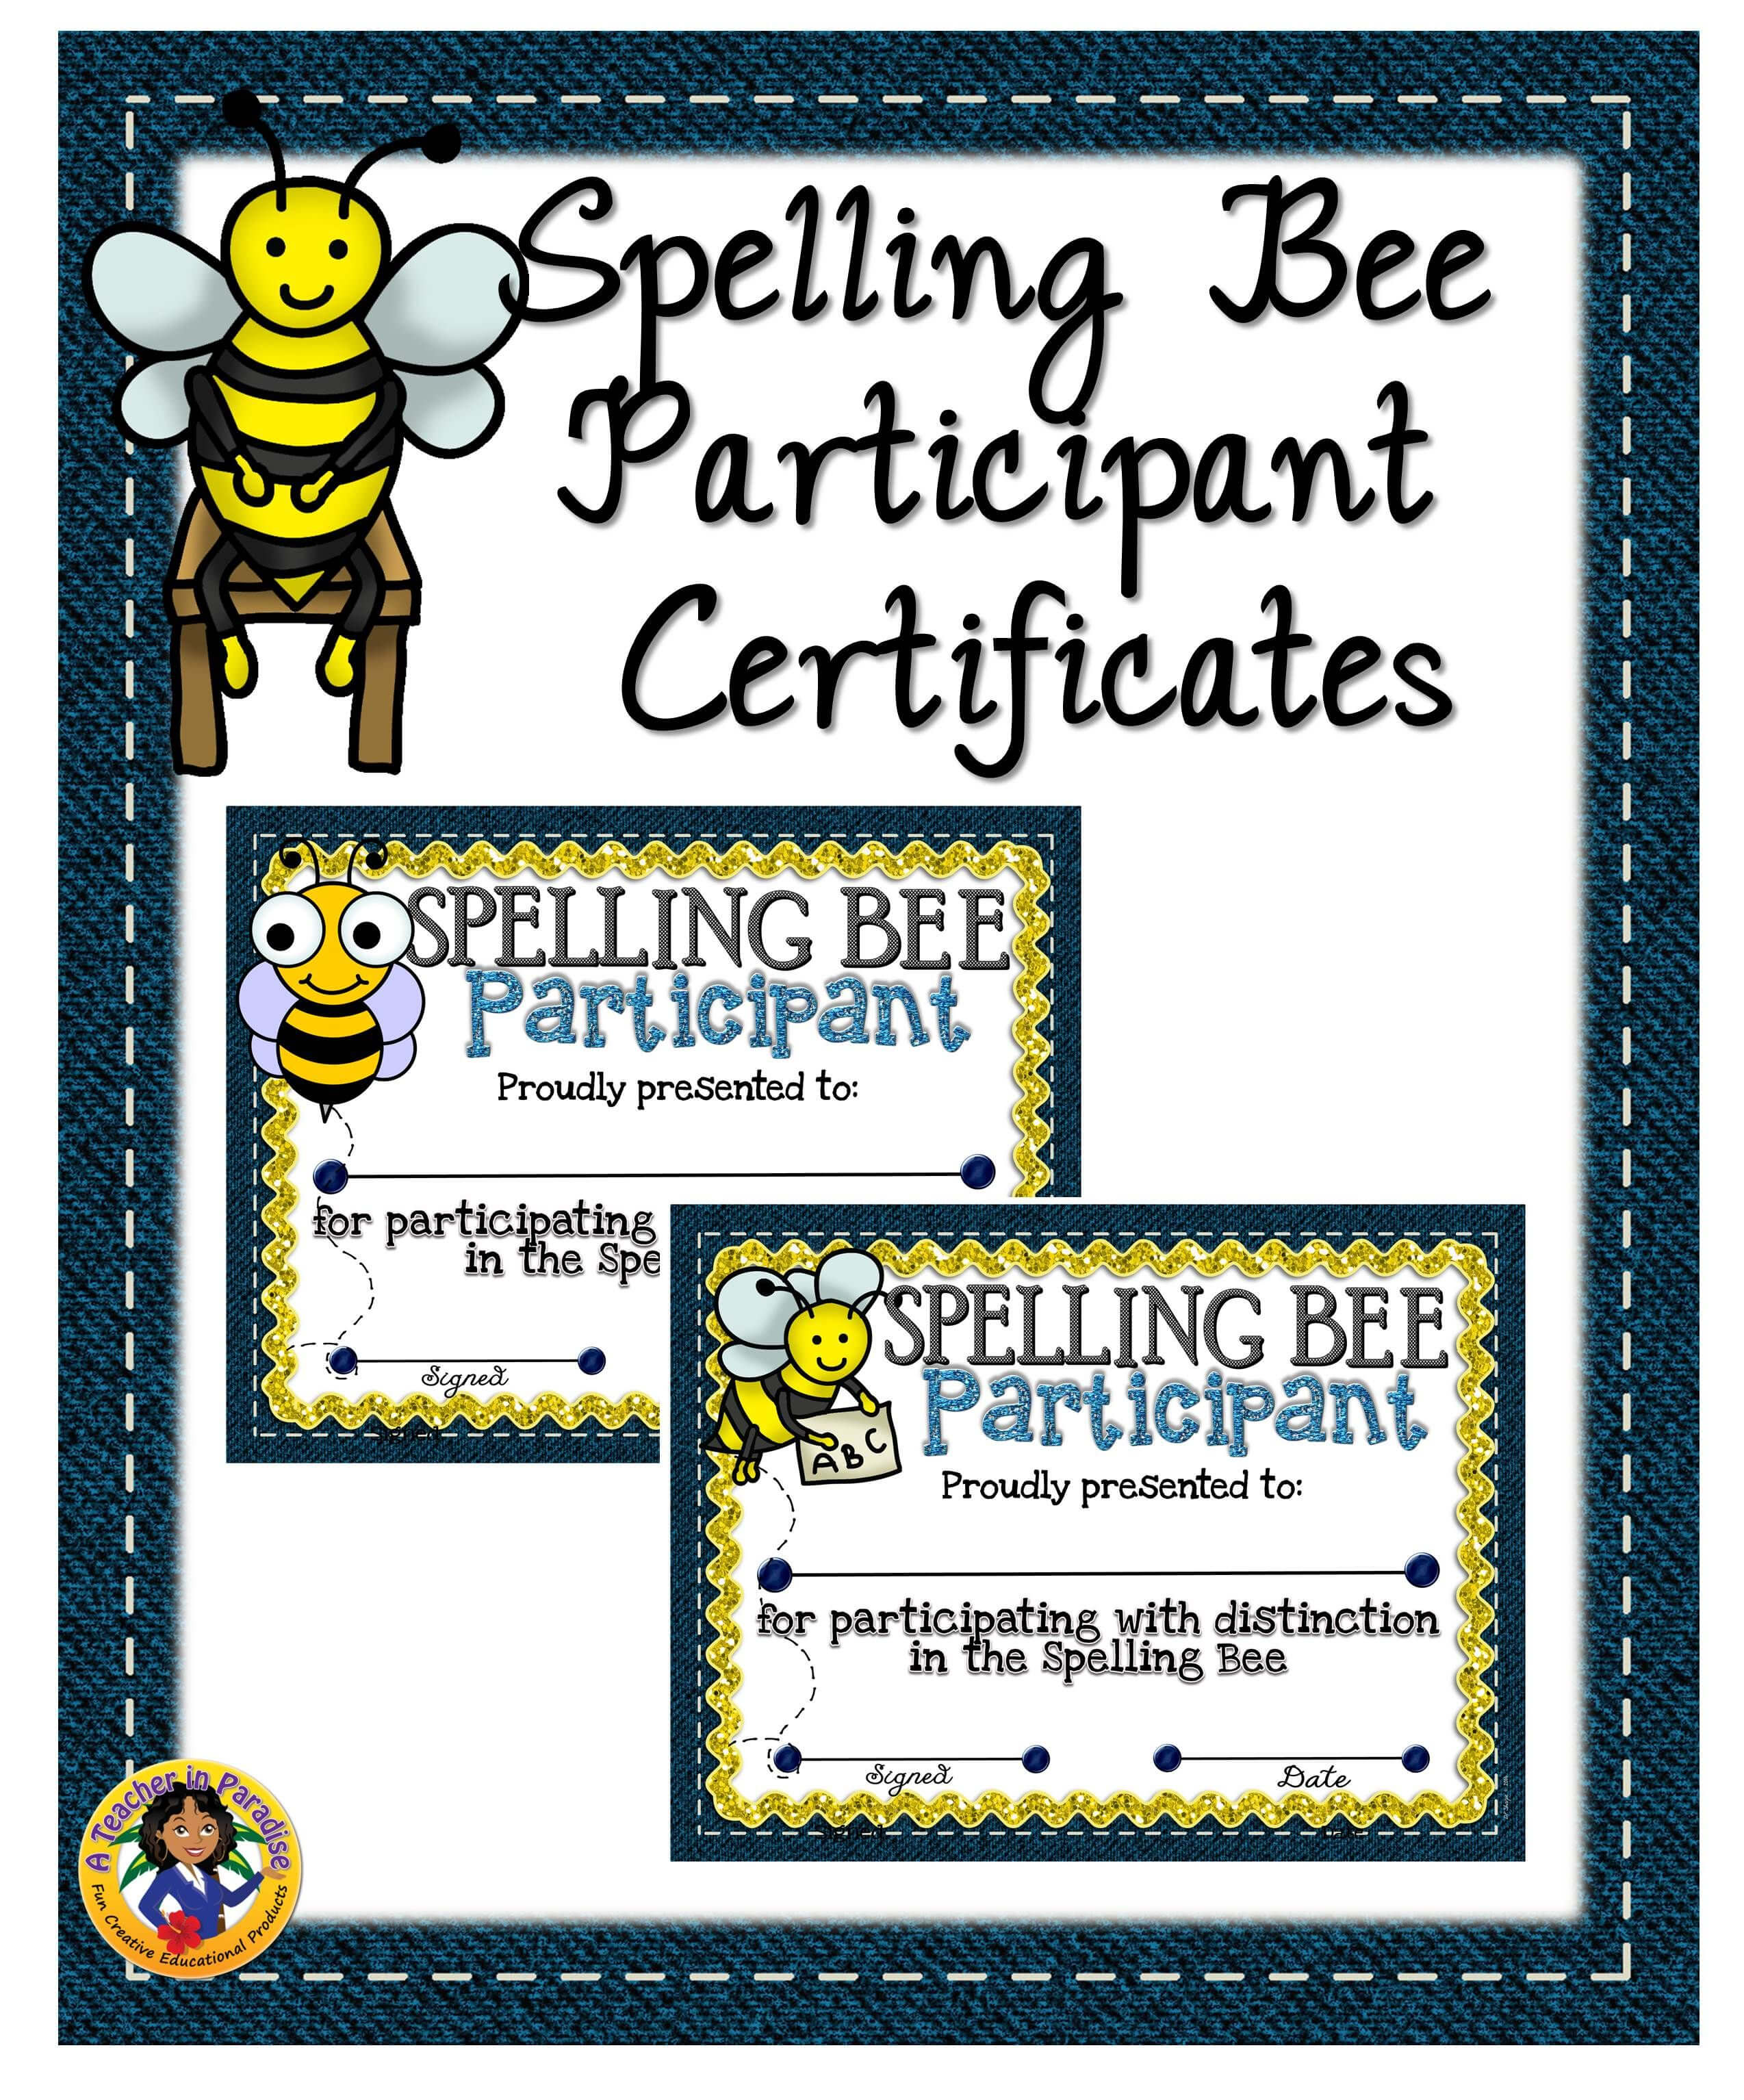 Spelling Bee Participant Certificates   Spelling Bee In Spelling Bee Award Certificate Template